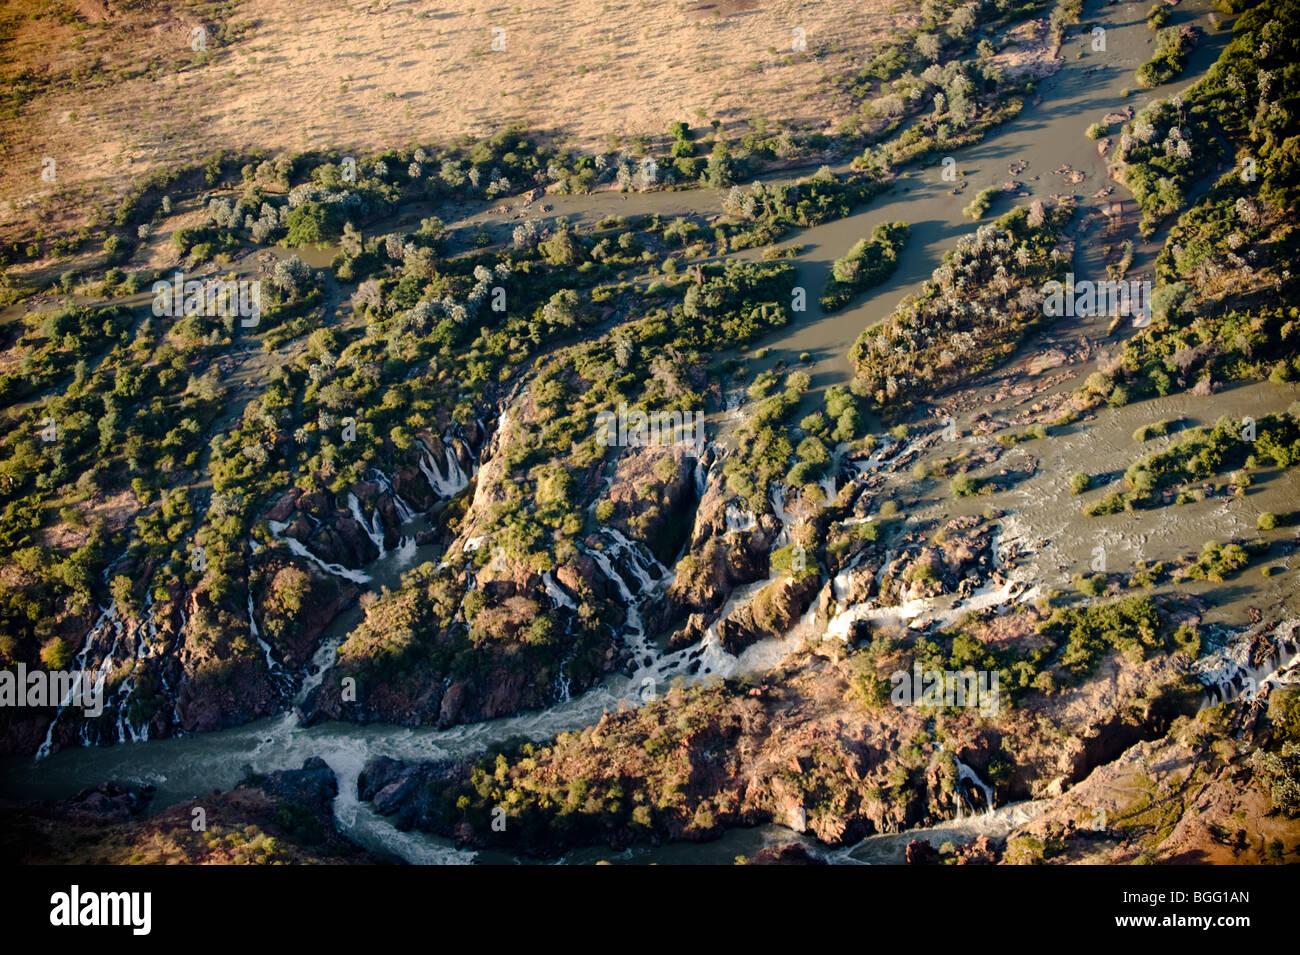 Epupa falls, Kunene river - Stock Image